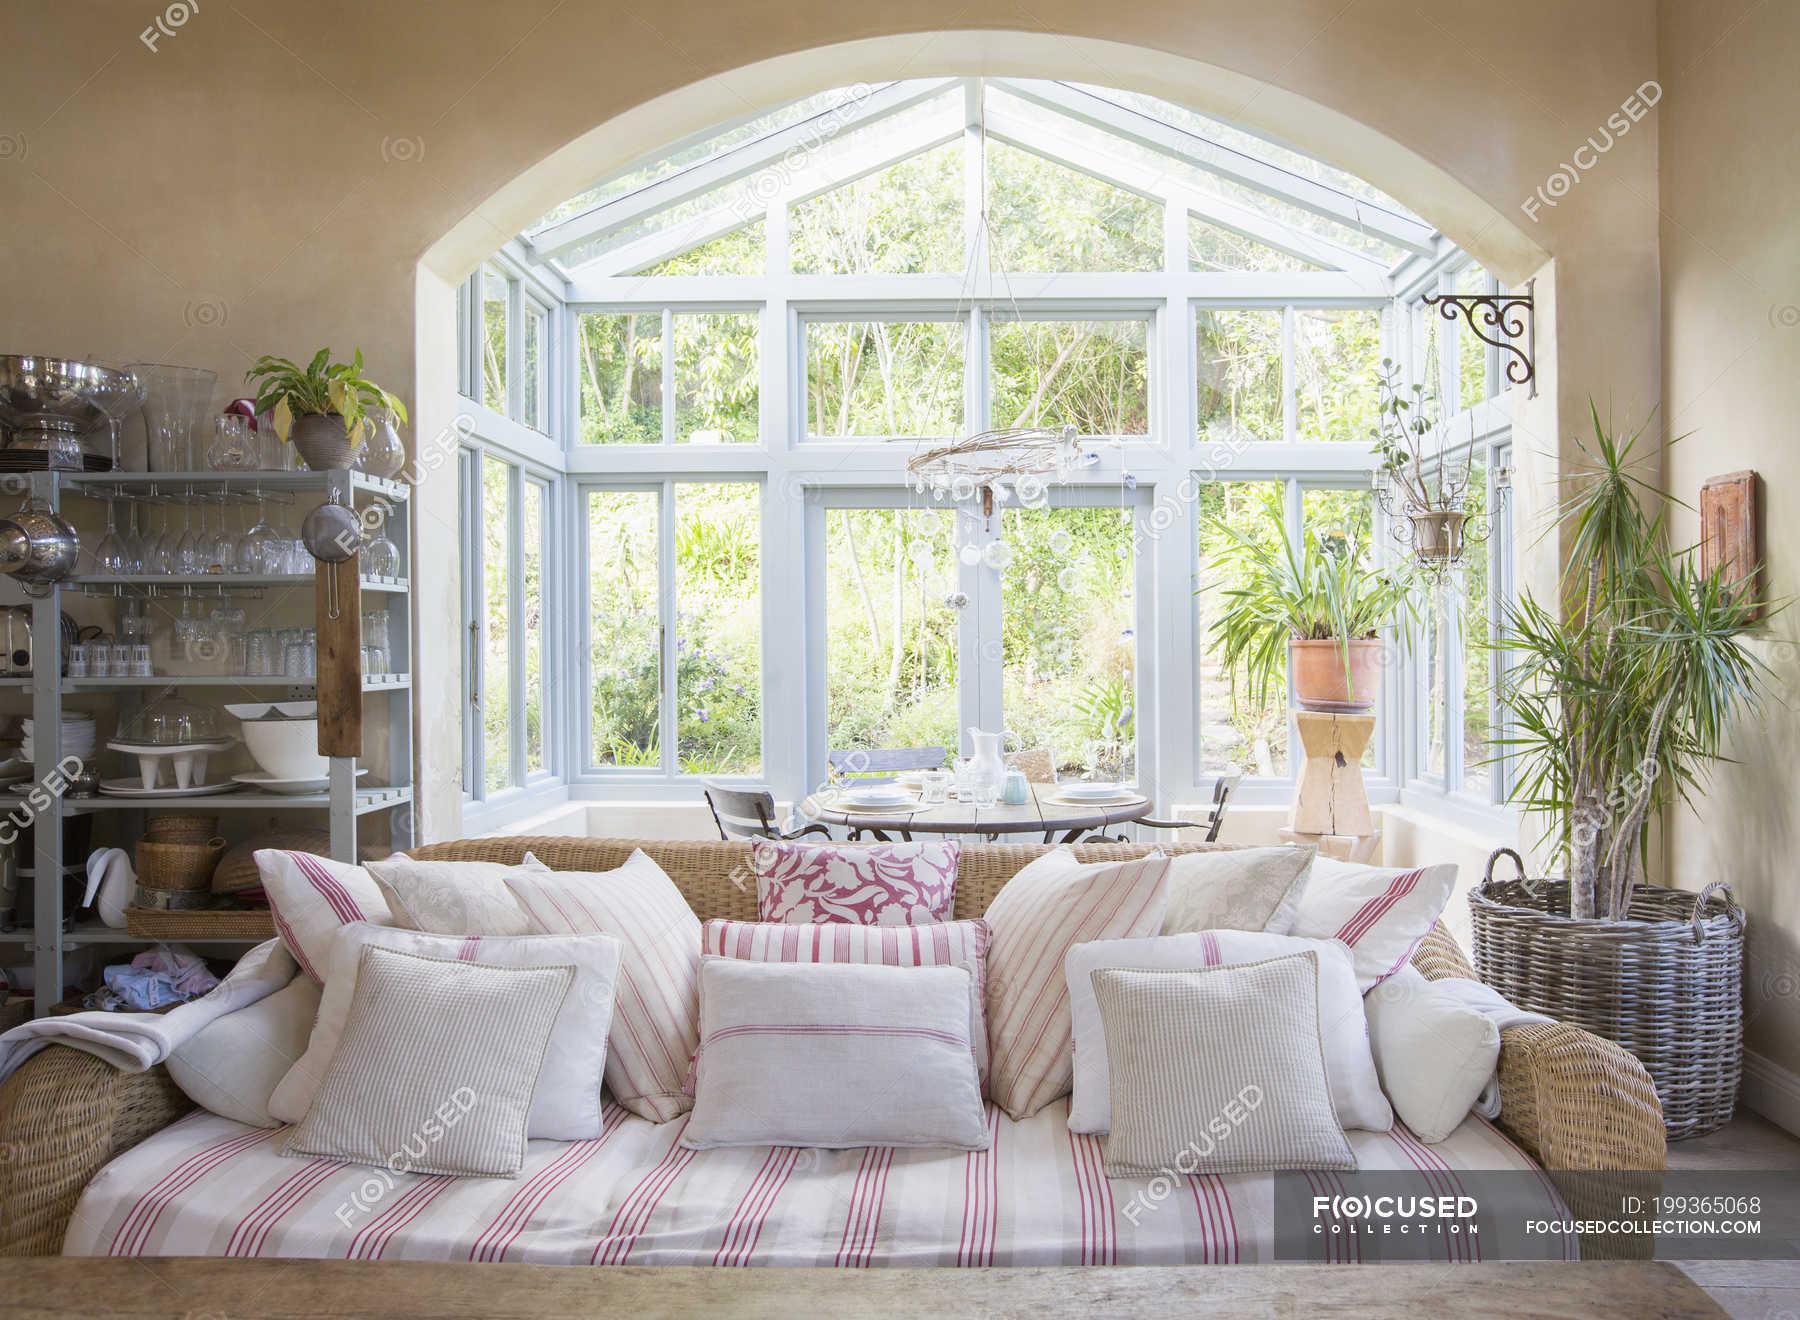 Shabby Chic Living Room And Sunroom, Shabby Chic Living Room